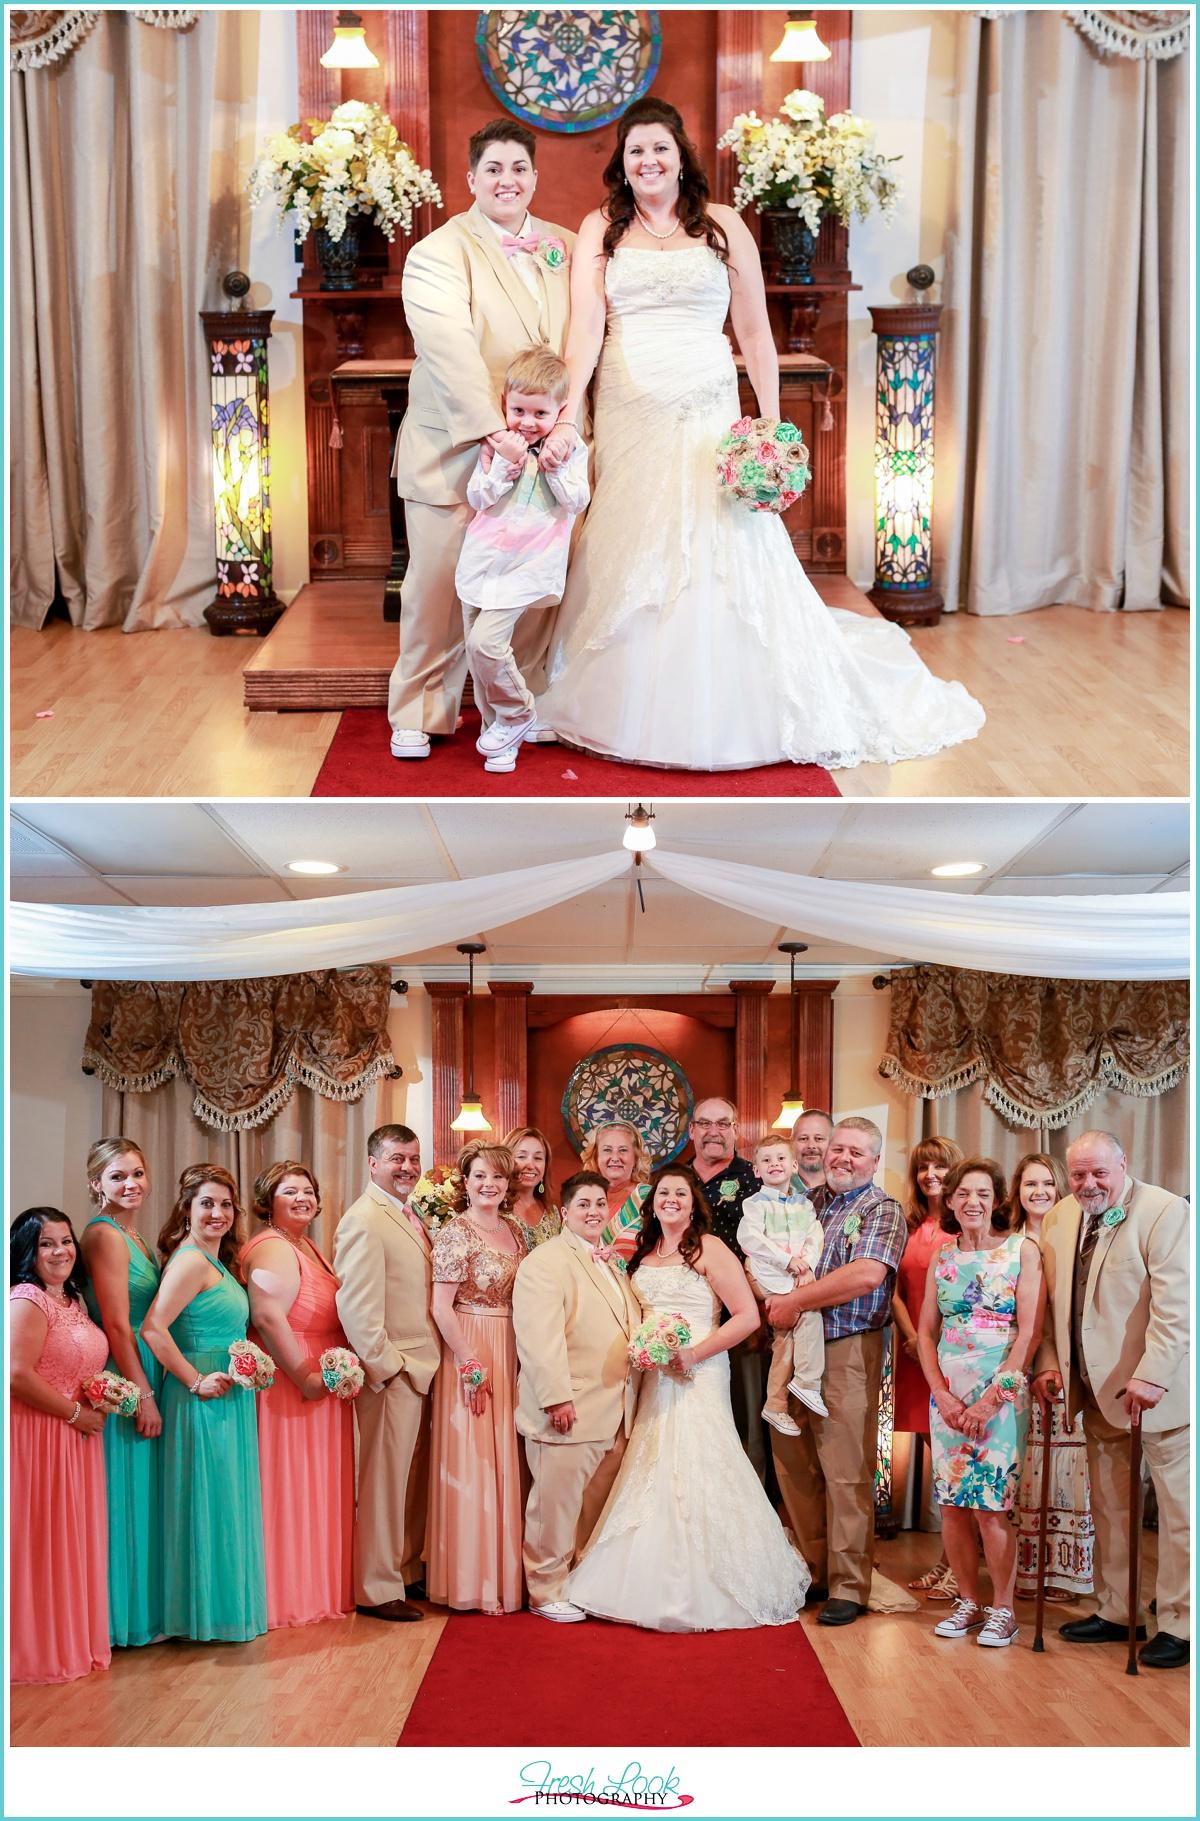 Big family photo at the wedding